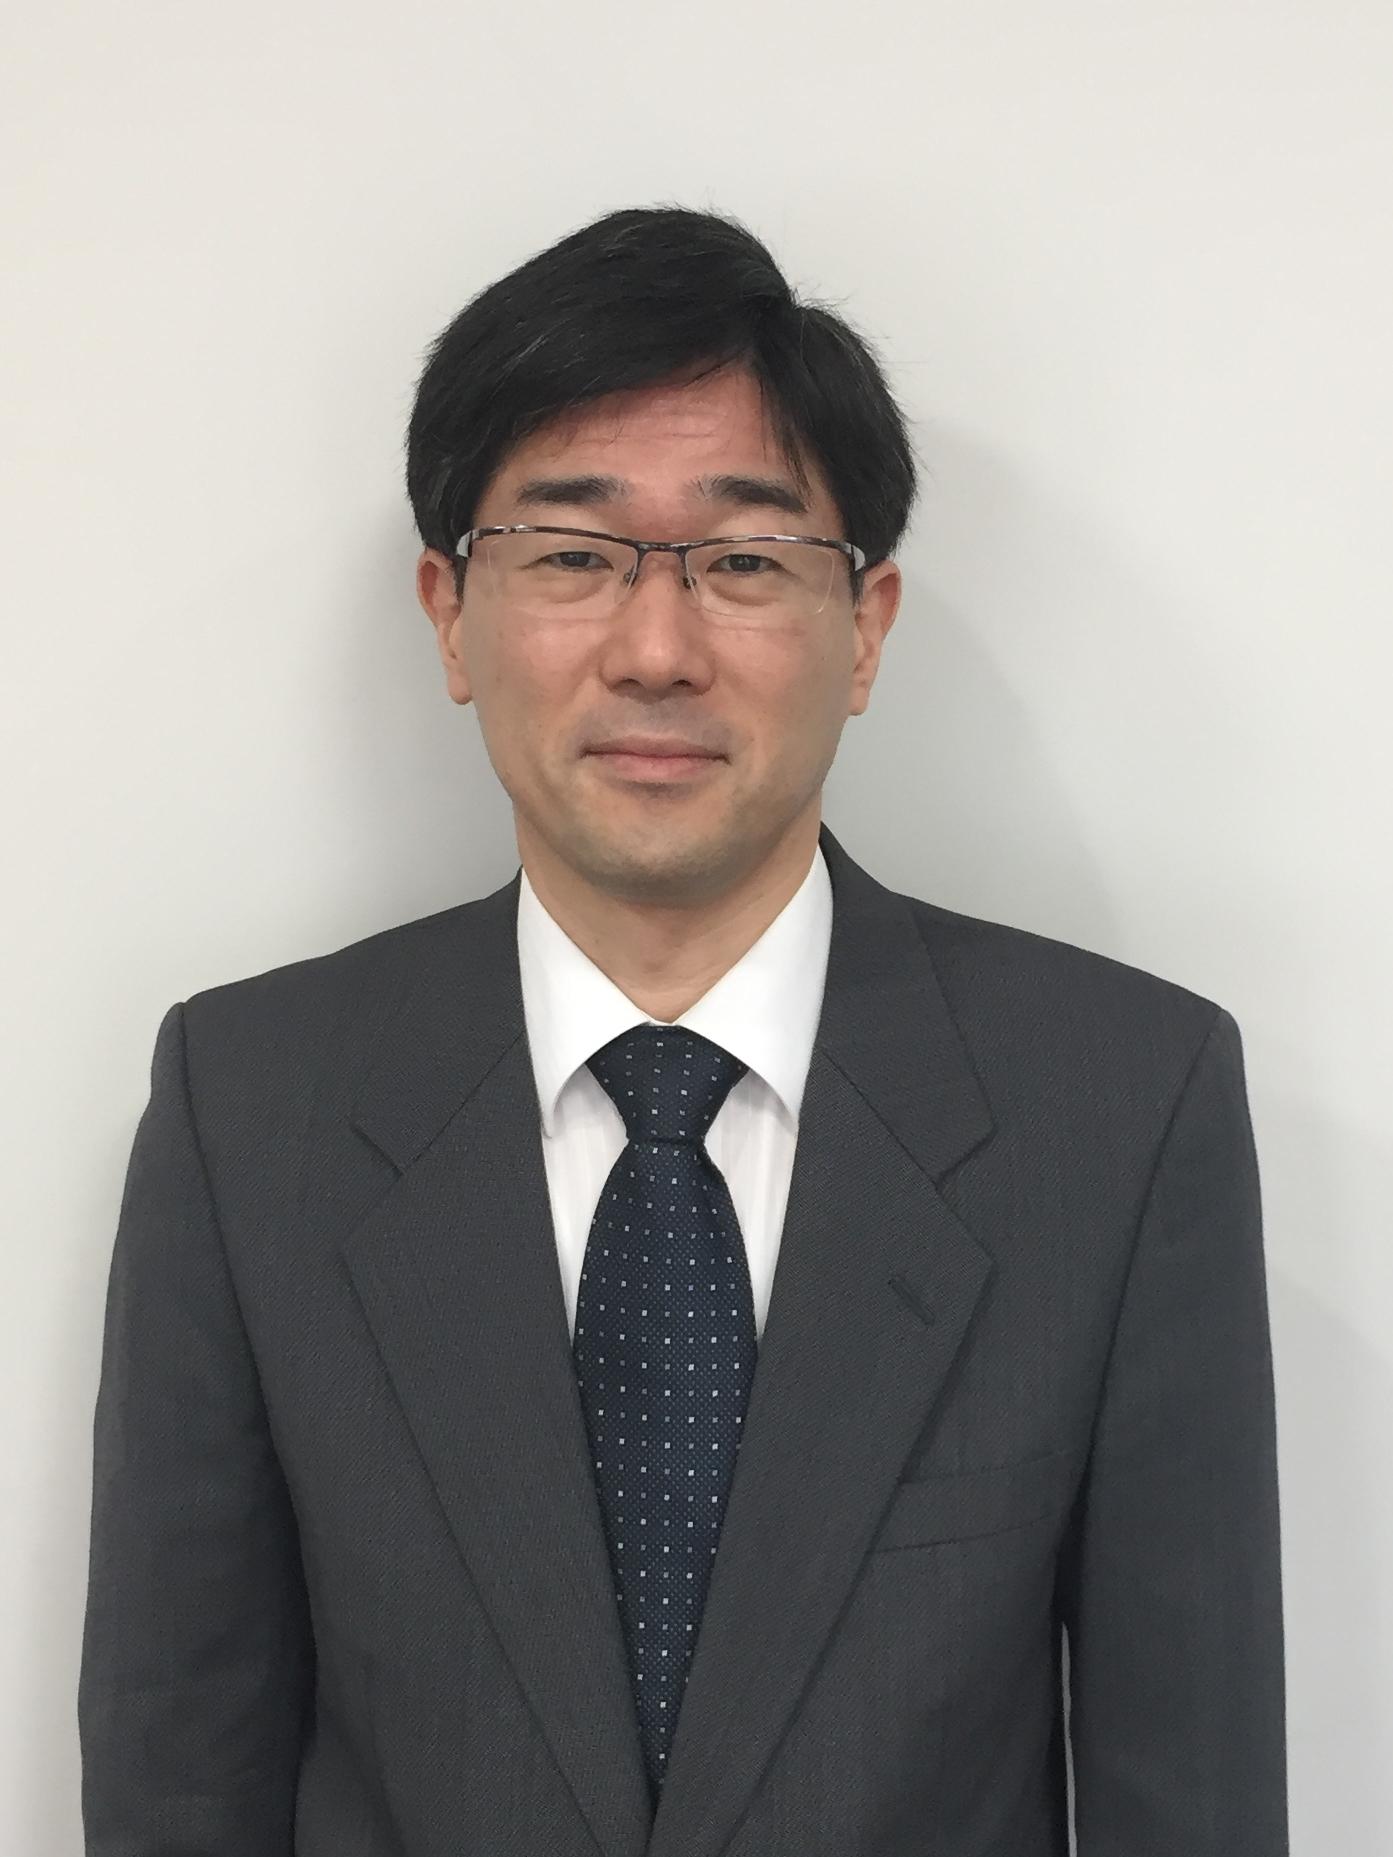 Masahiro Atarashi - Director and General Manager, home electrical appliances, The Japan Electrical Manufacturers' Association (JEMA)